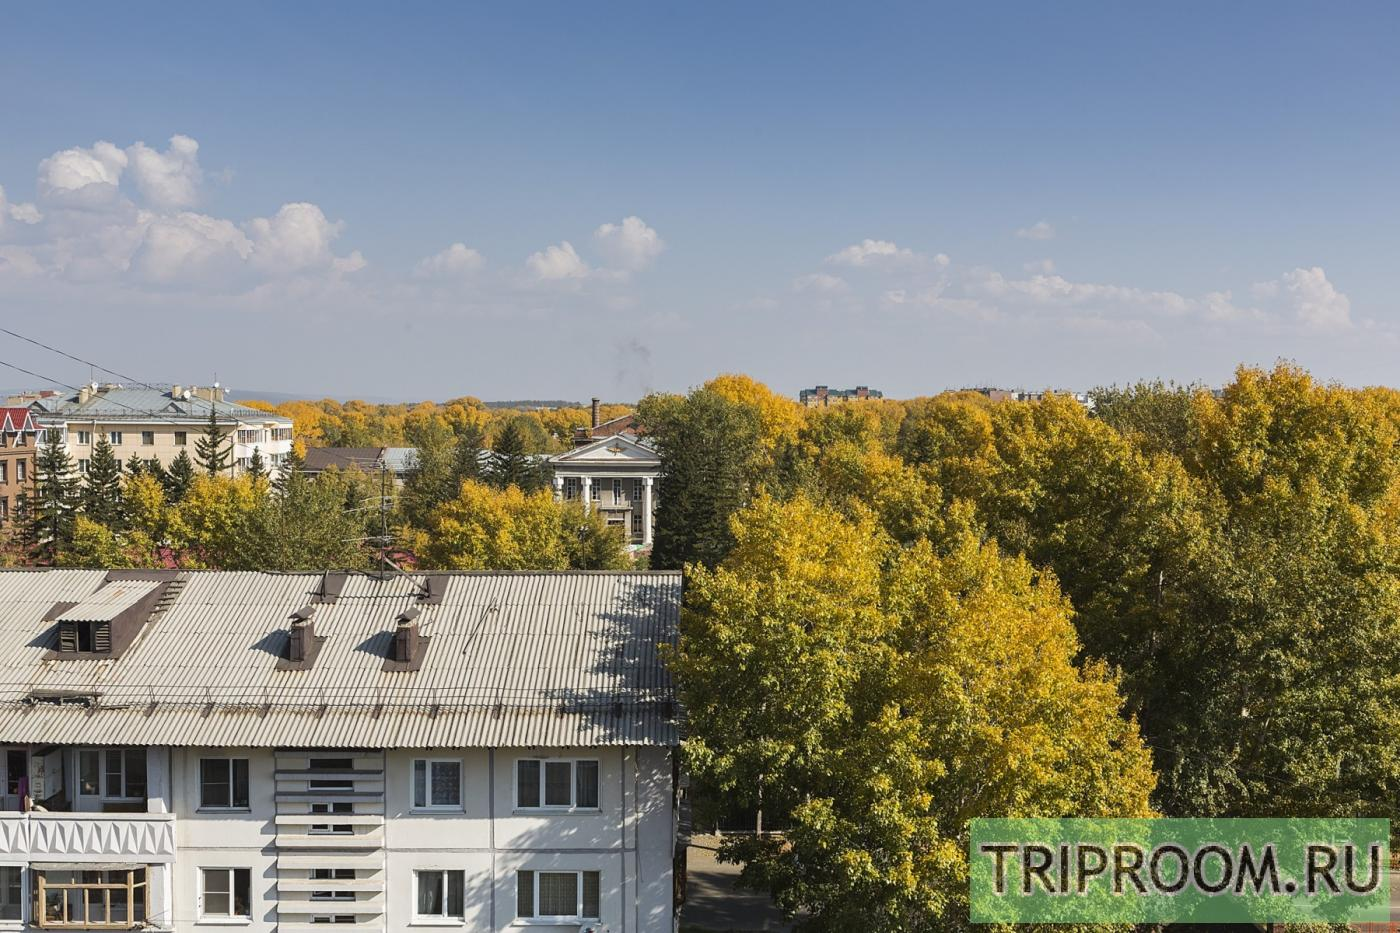 1-комнатная квартира посуточно (вариант № 35709), ул. Ядринцева улица, фото № 7